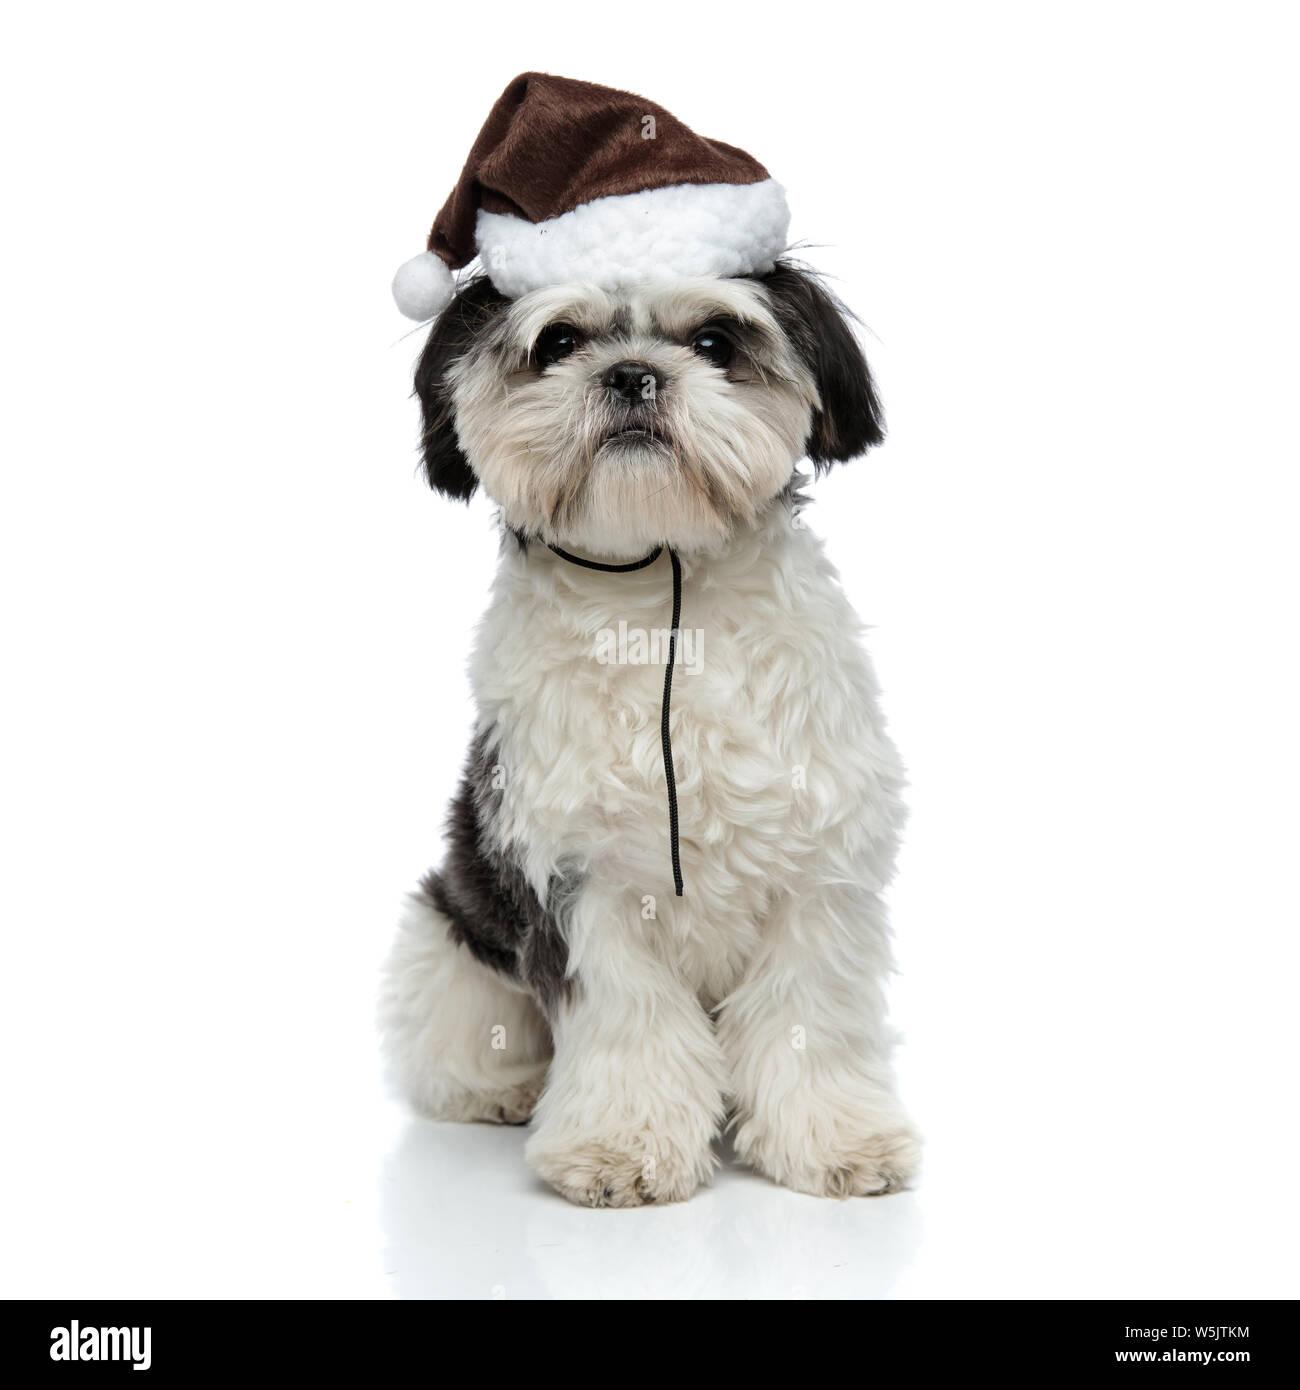 Cute Shih Tzu Wearing Santa Hat Sits On White Background Stock Photo Alamy